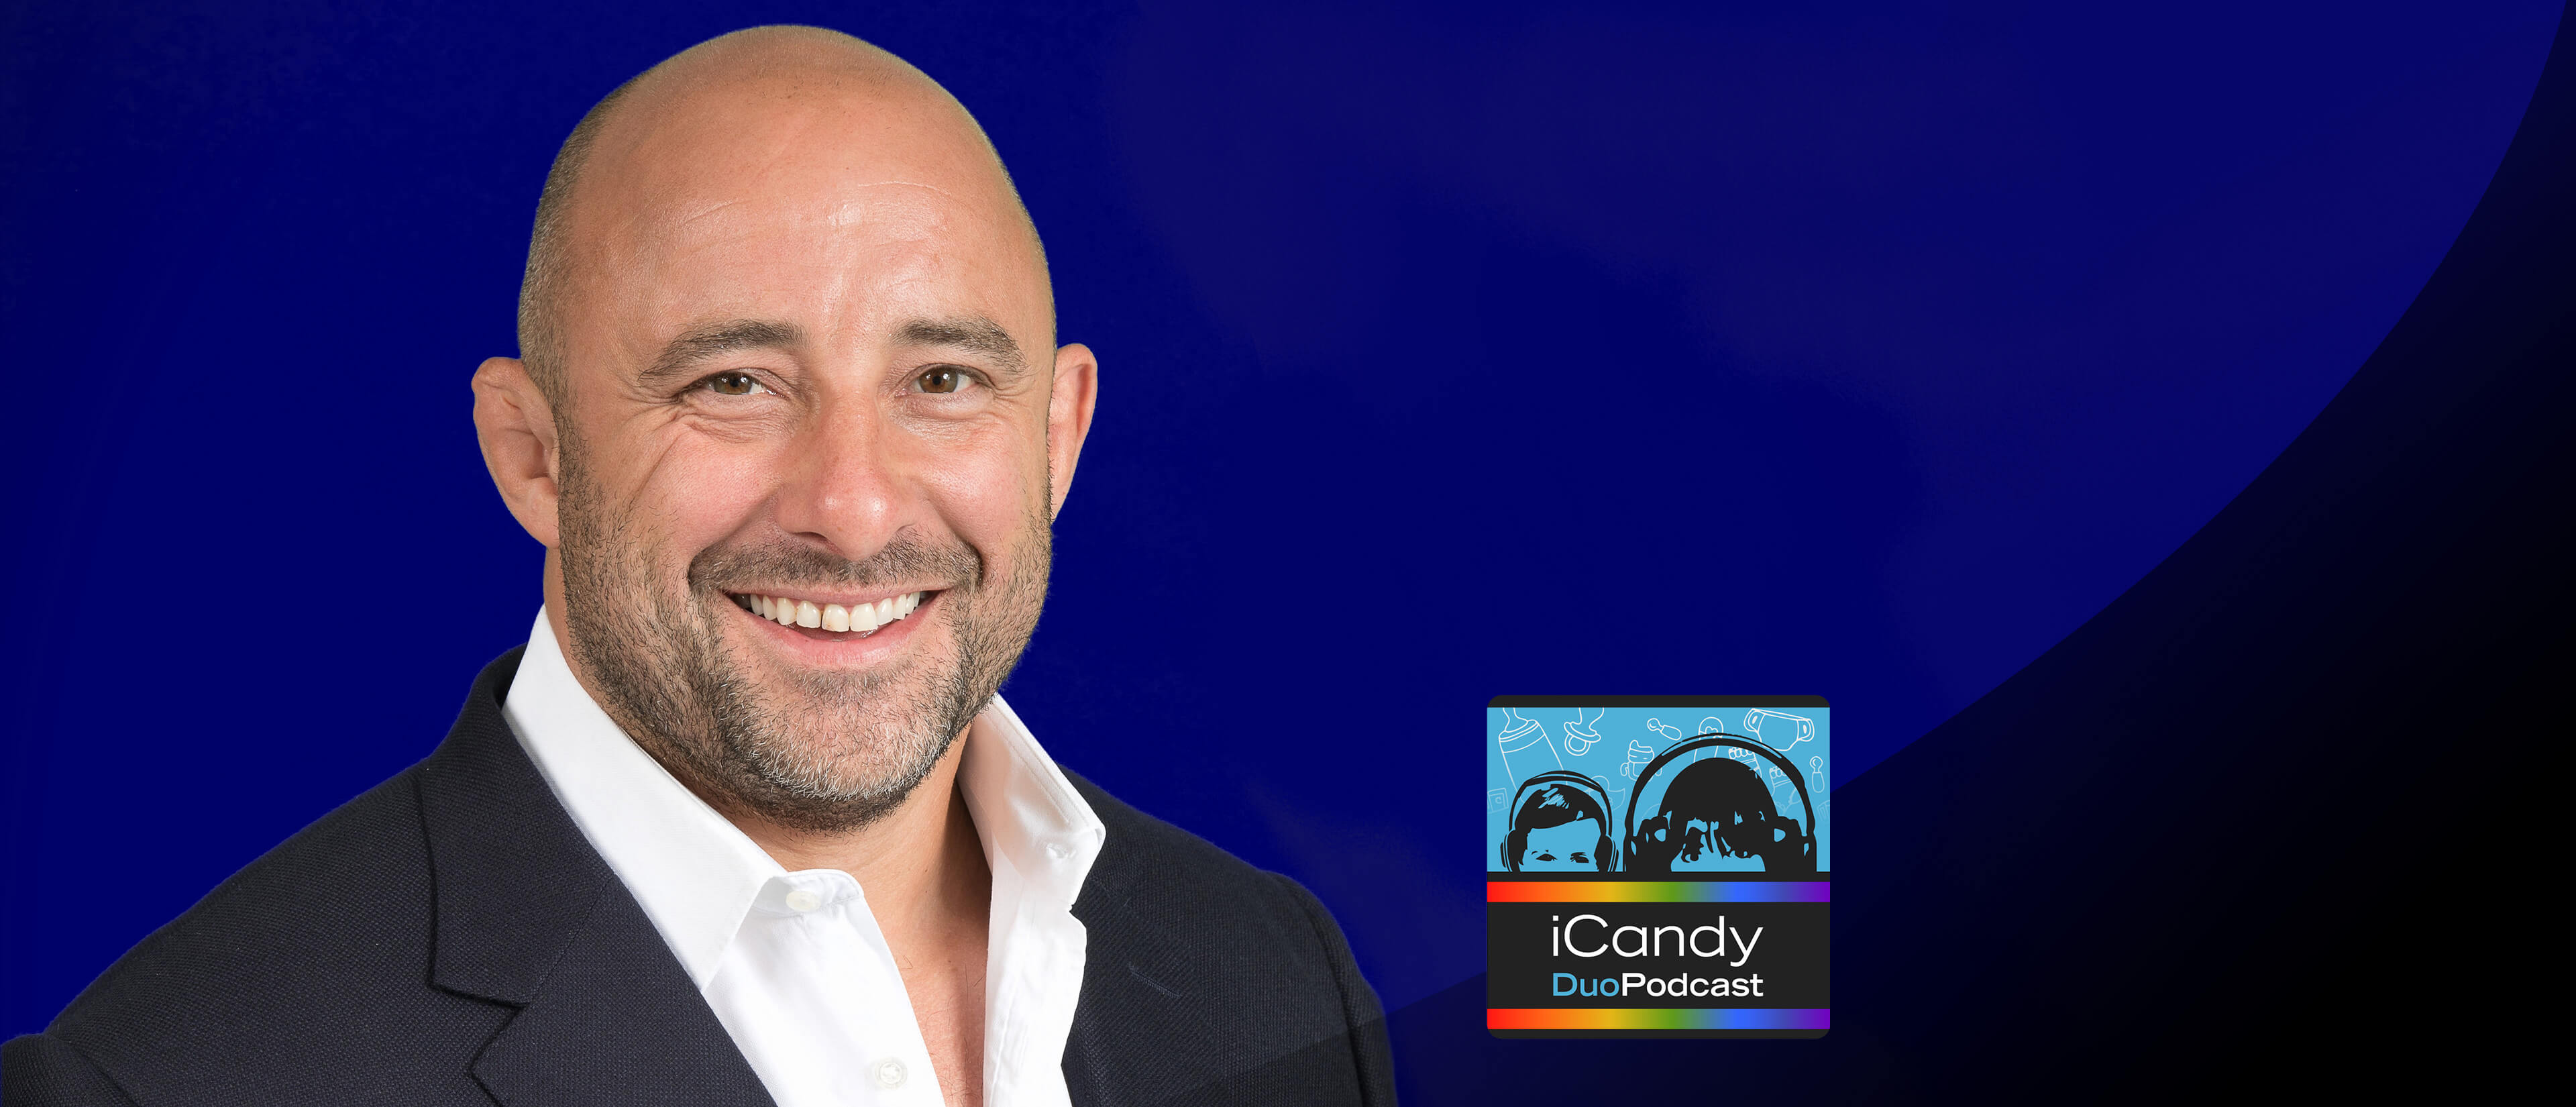 iCandy Duo Podcast - David Flatman